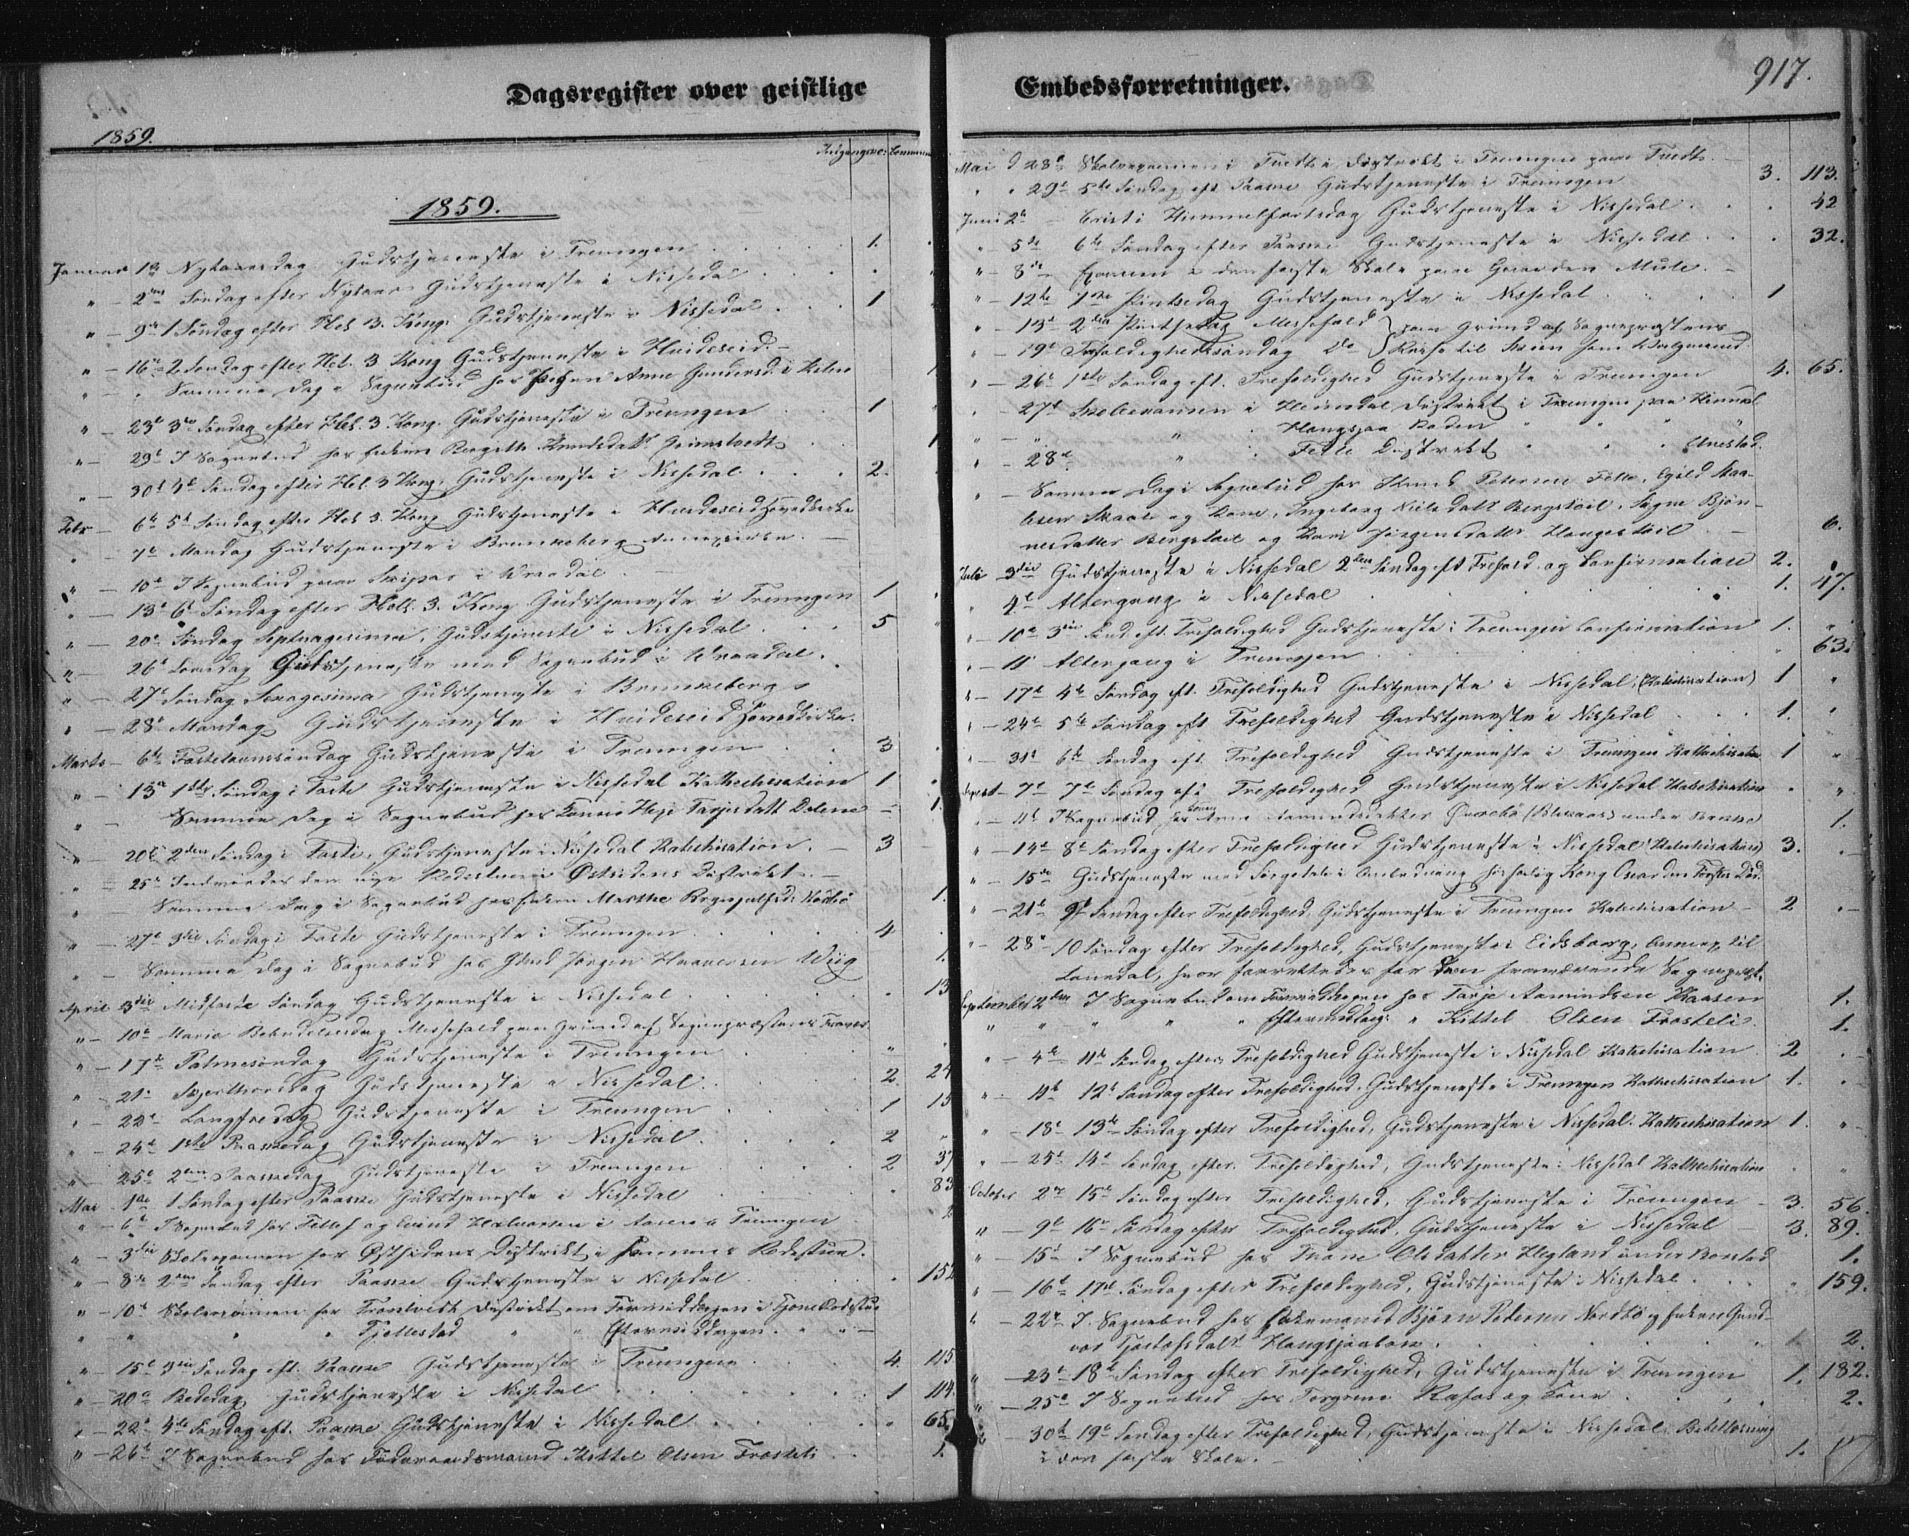 SAKO, Nissedal kirkebøker, F/Fa/L0003: Ministerialbok nr. I 3, 1846-1870, s. 916-917